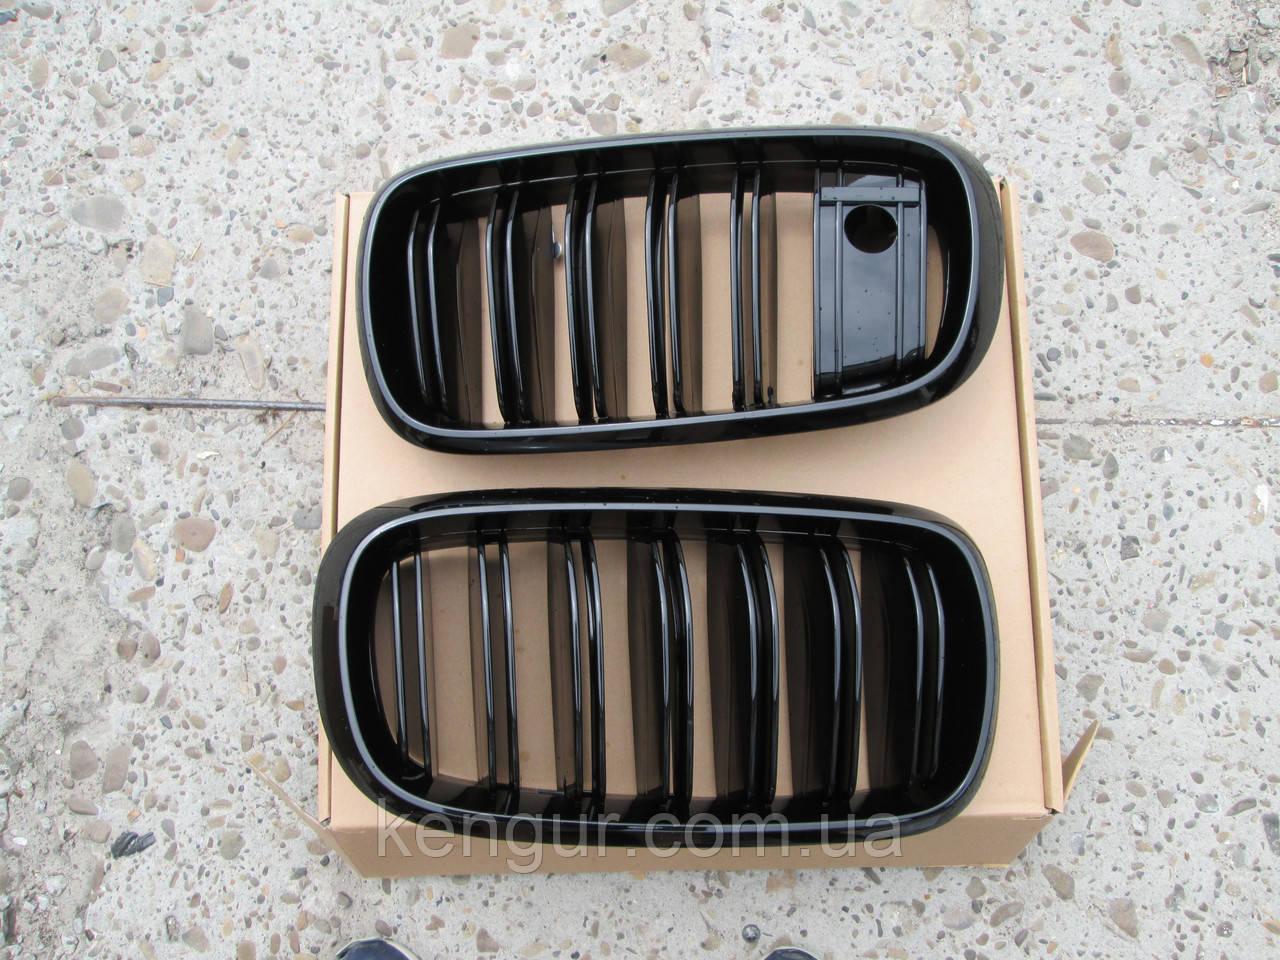 Решетка радиатора BMW X5 F15 под камеру